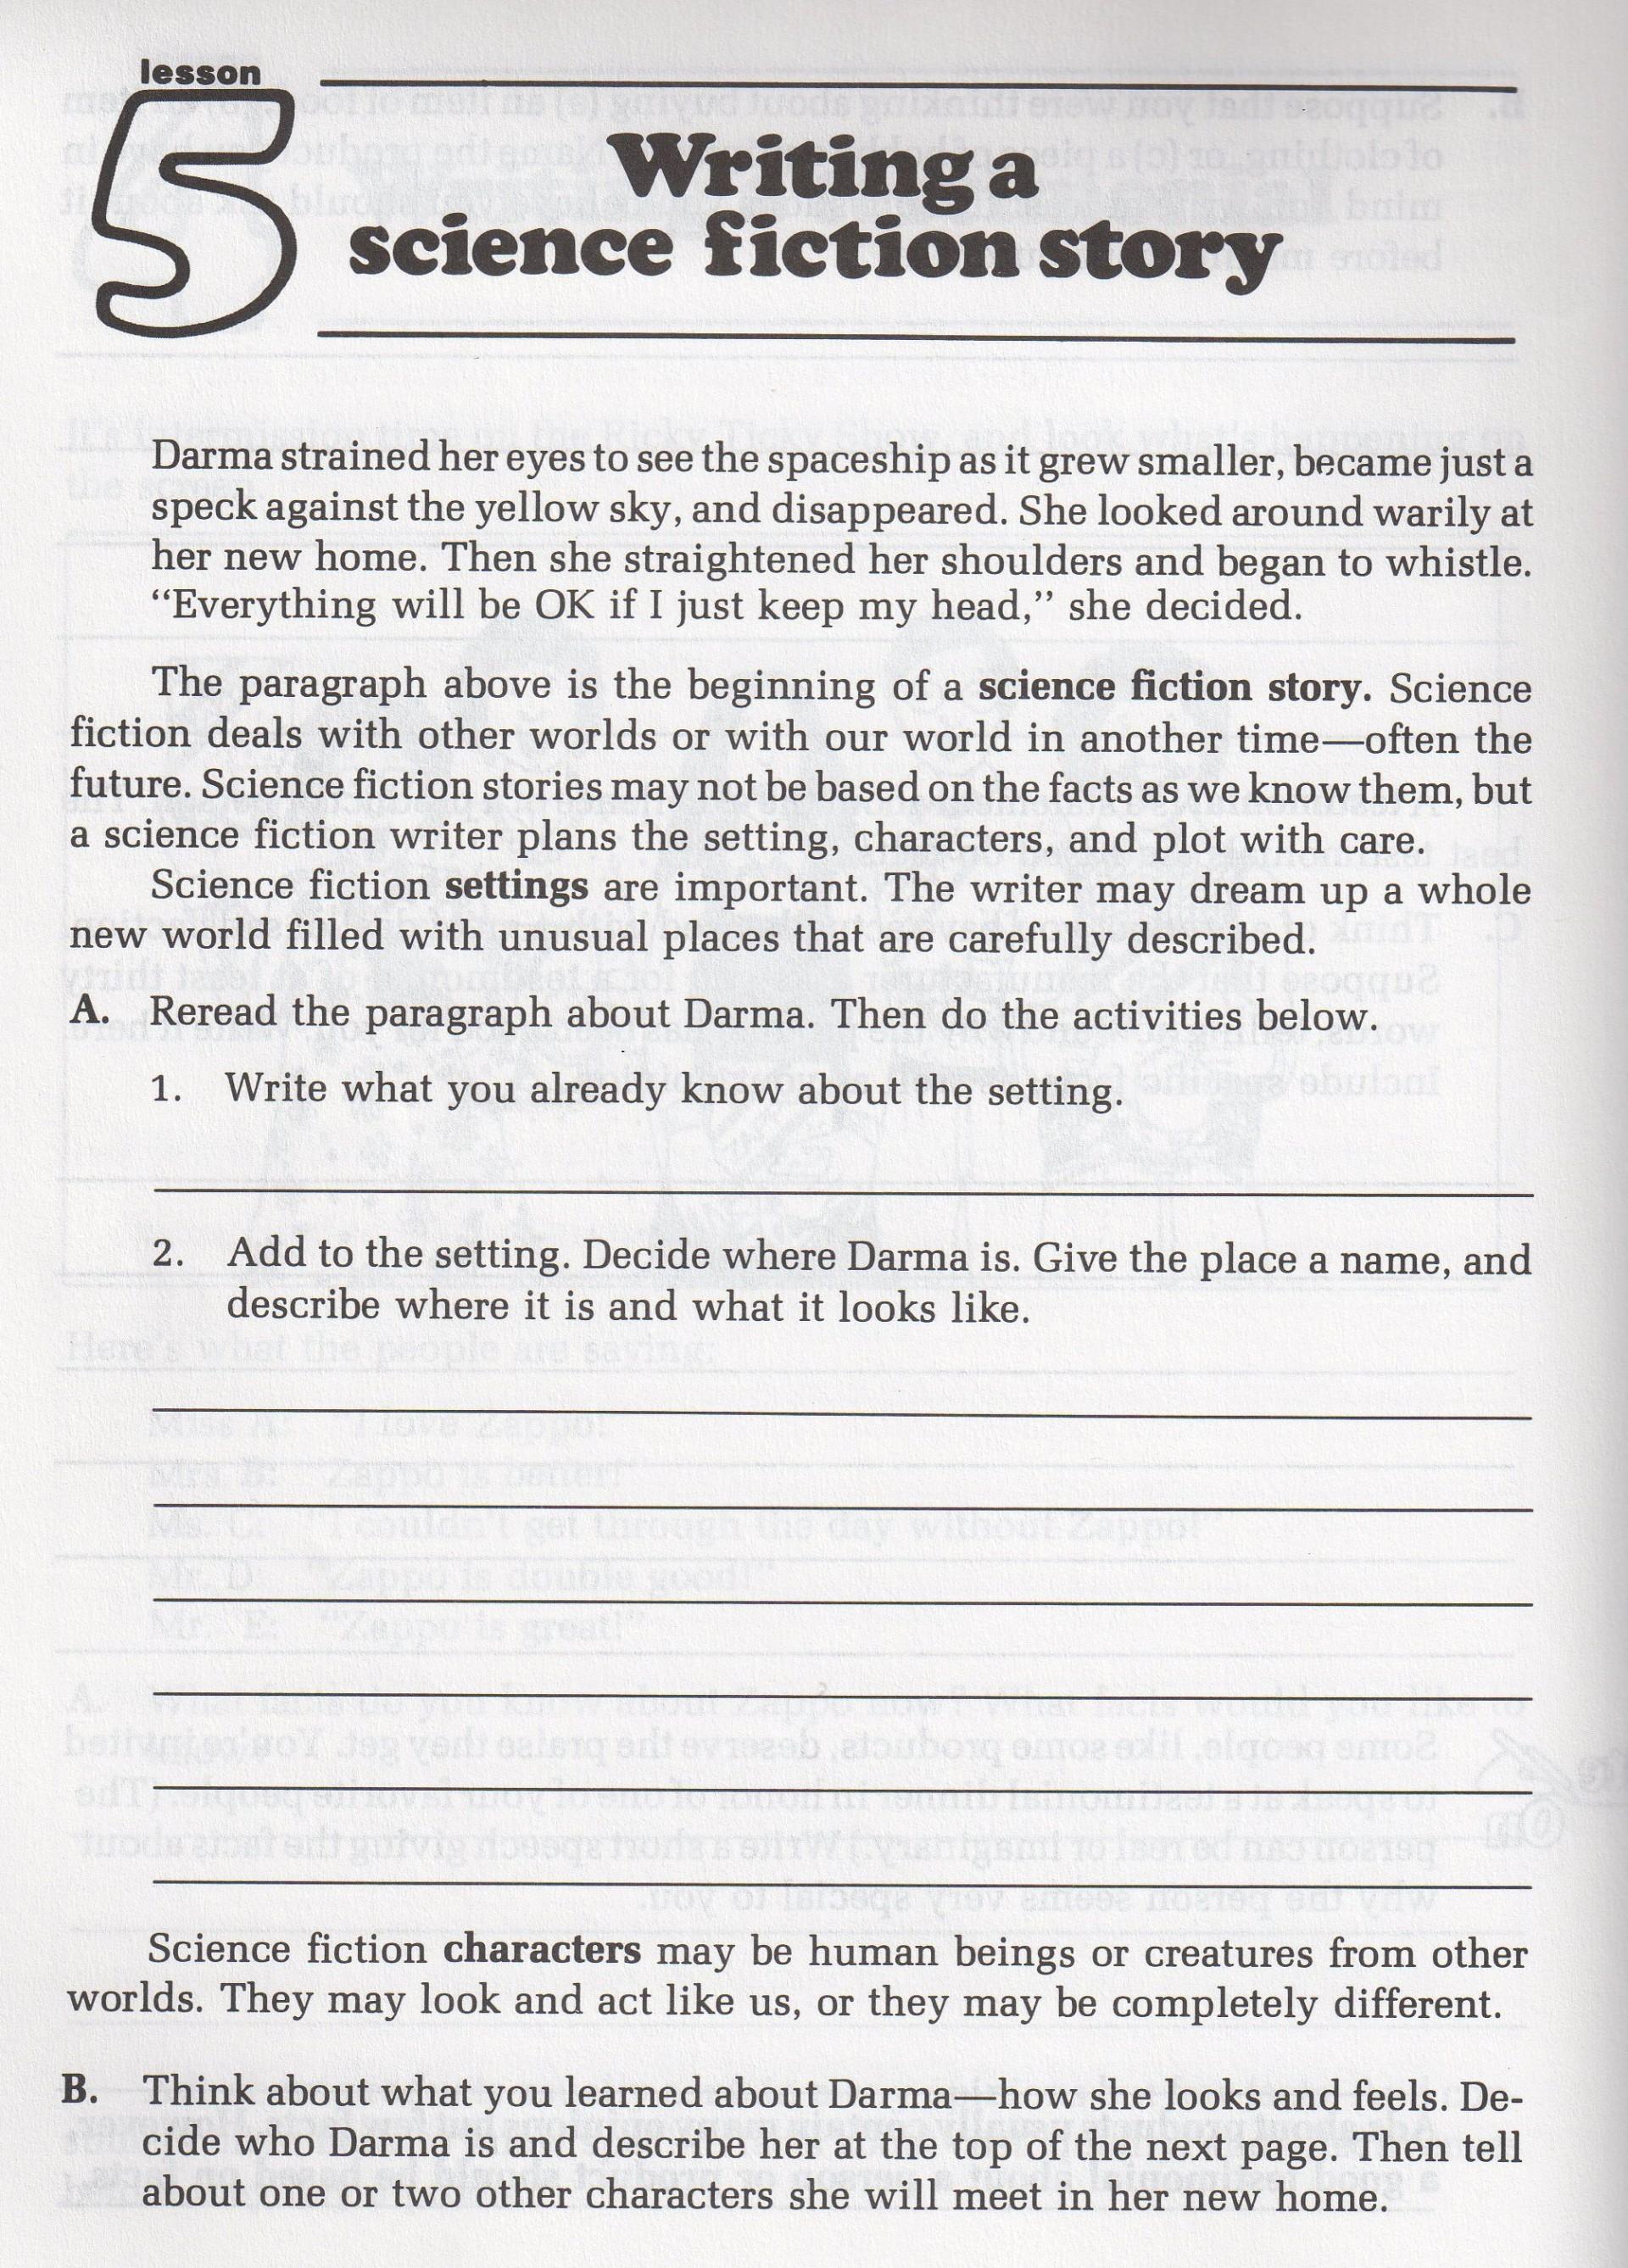 017 Writing Science Fiction Story Descriptive Essay Thesis Rare Statement Generator Pdf 1920